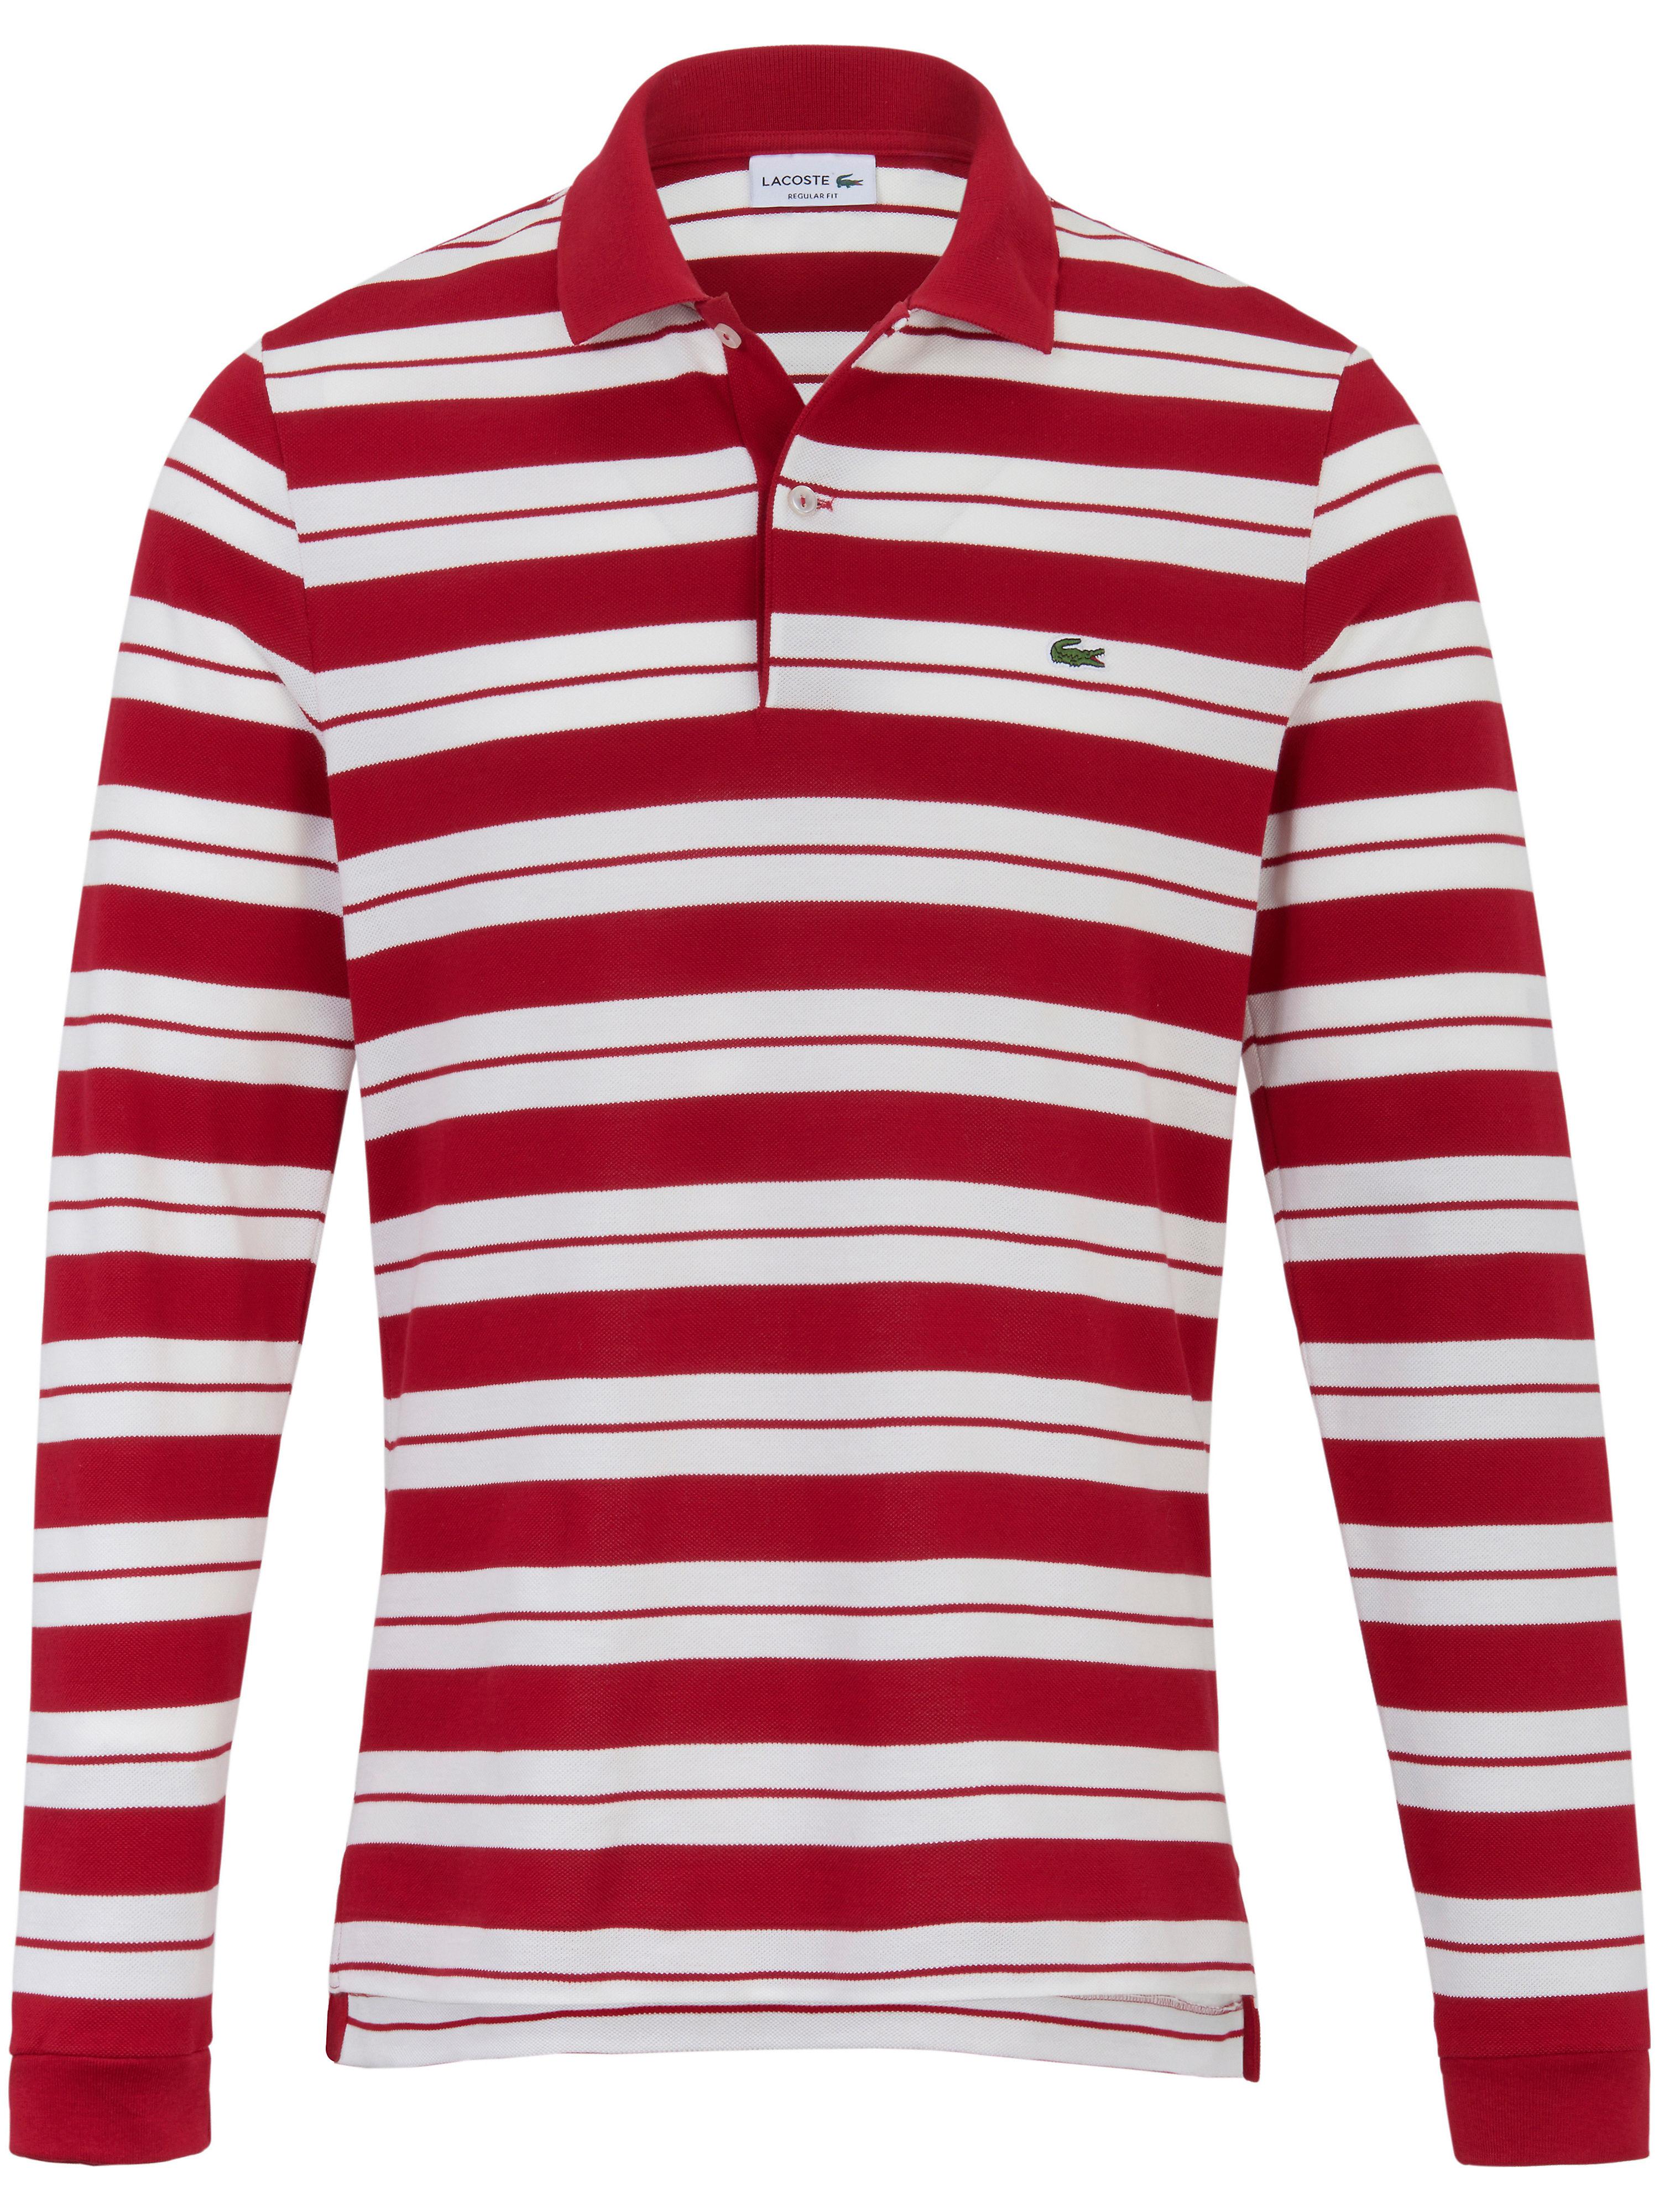 Image of   Poloshirt Form PH7128 maskuline striber Fra Lacoste rød